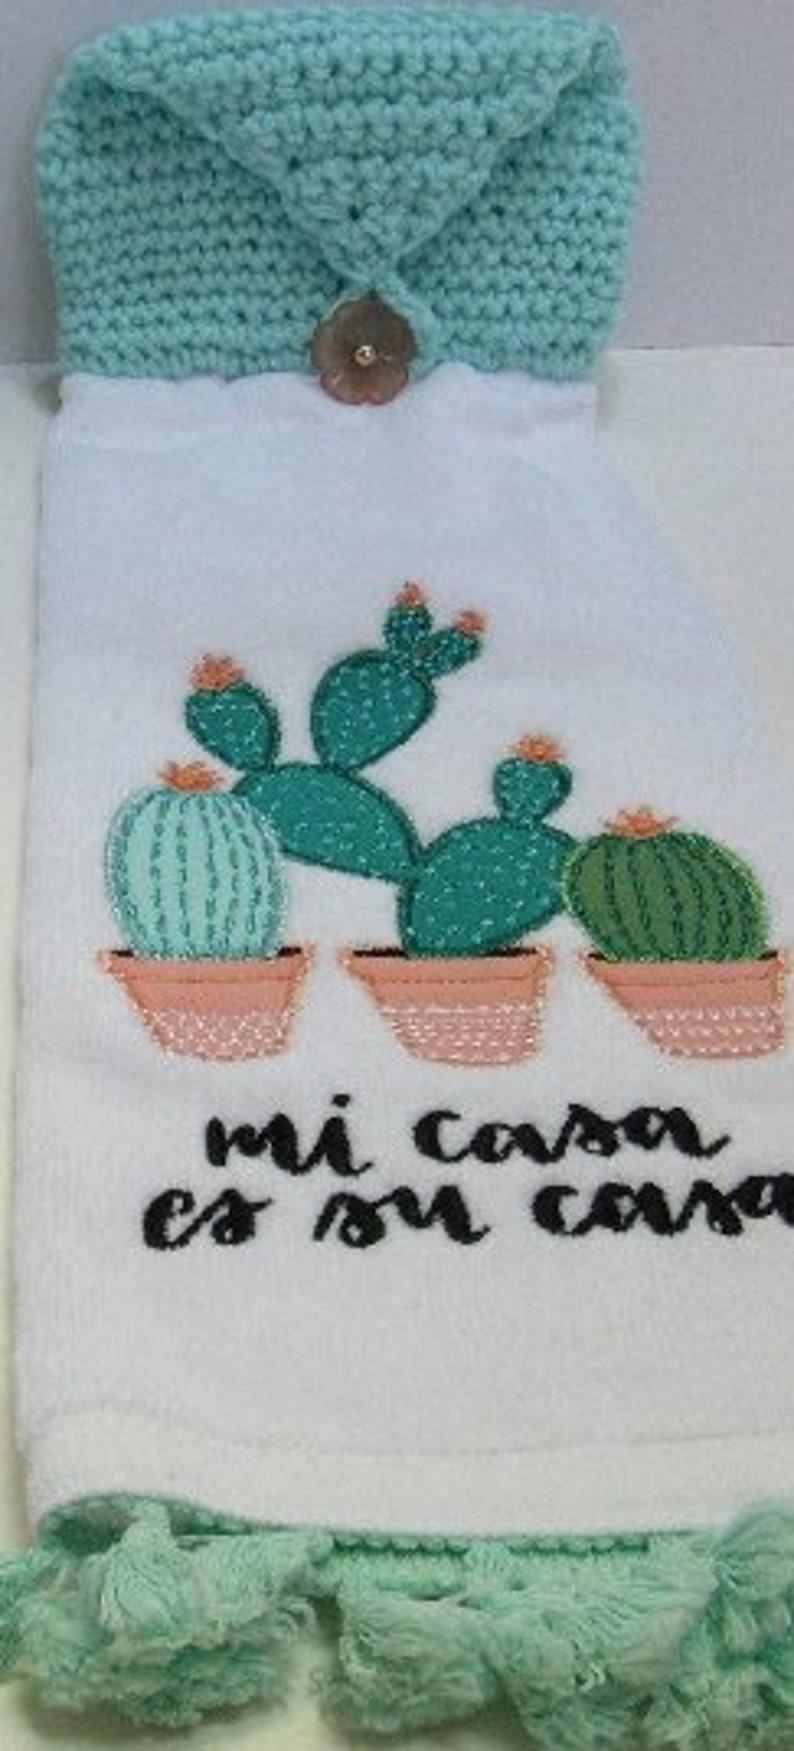 Hanging Kitchen Towels, Button Top, White Cotton, Mi Casa es Su Casa,  Cactus, Dish towel, Refrigerator Oven Door, Crochet Housewarming Gift